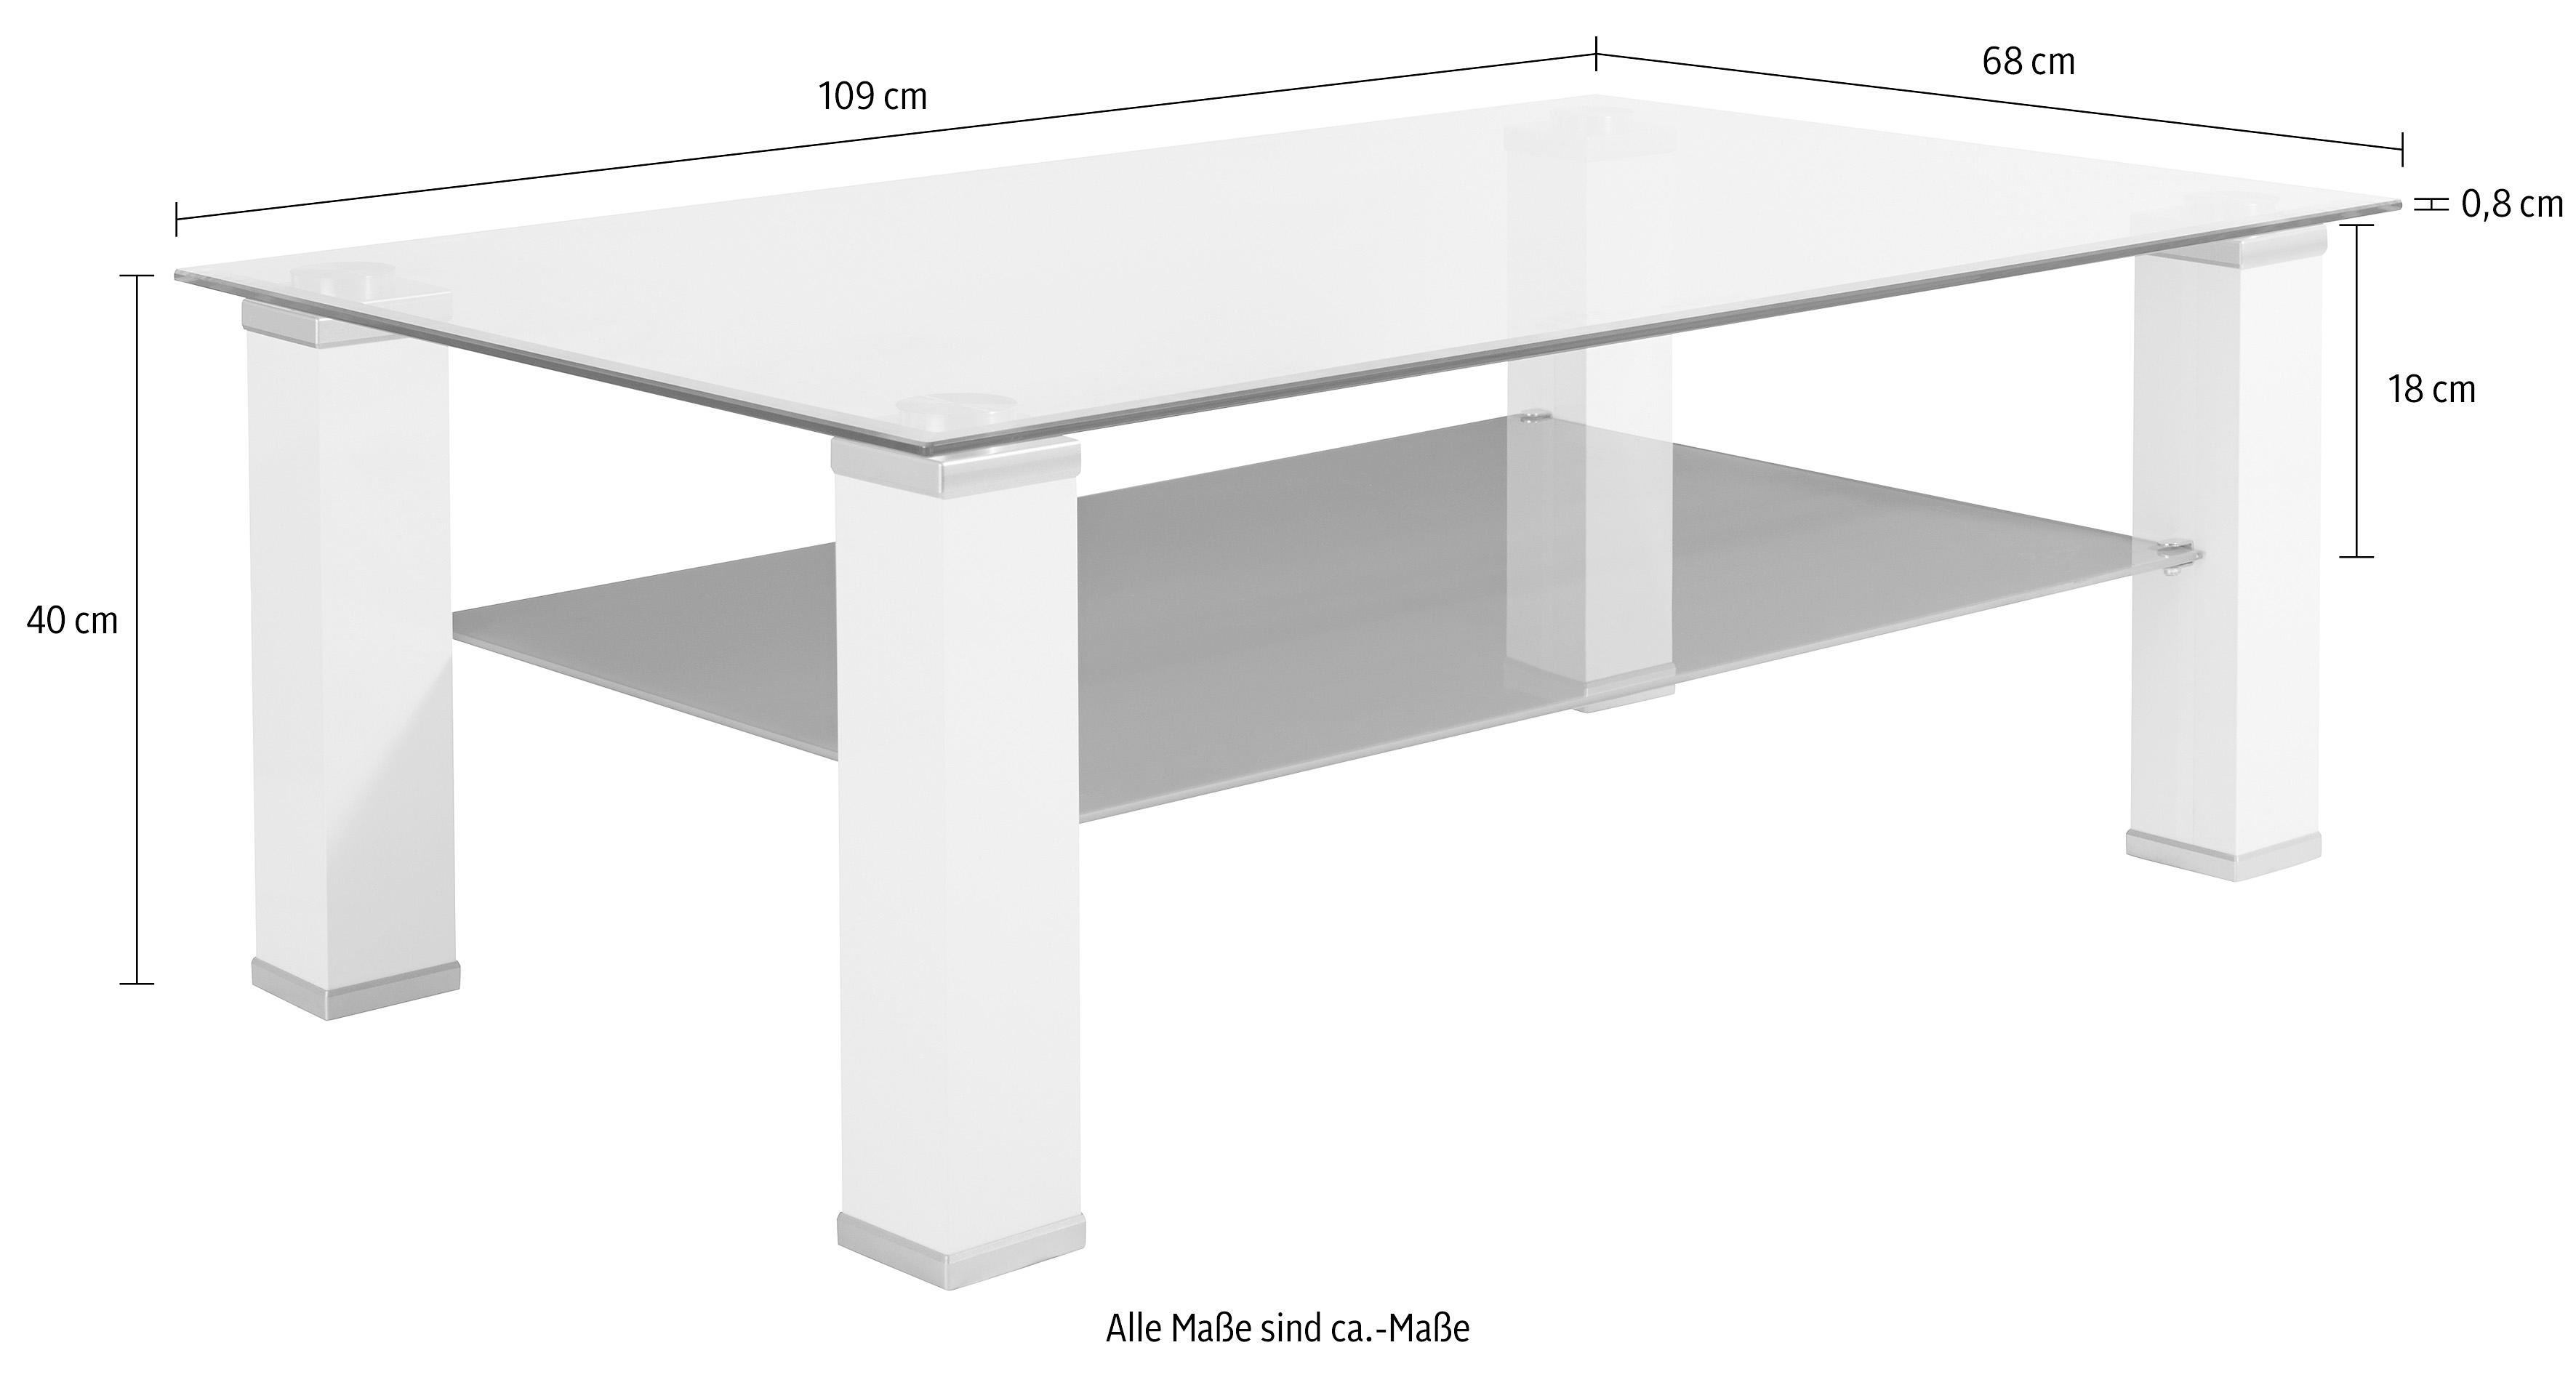 Hoogglans Witte Salontafel Met Glasplaat.Salontafel Met Glasplaat Makkelijk Gevonden Otto